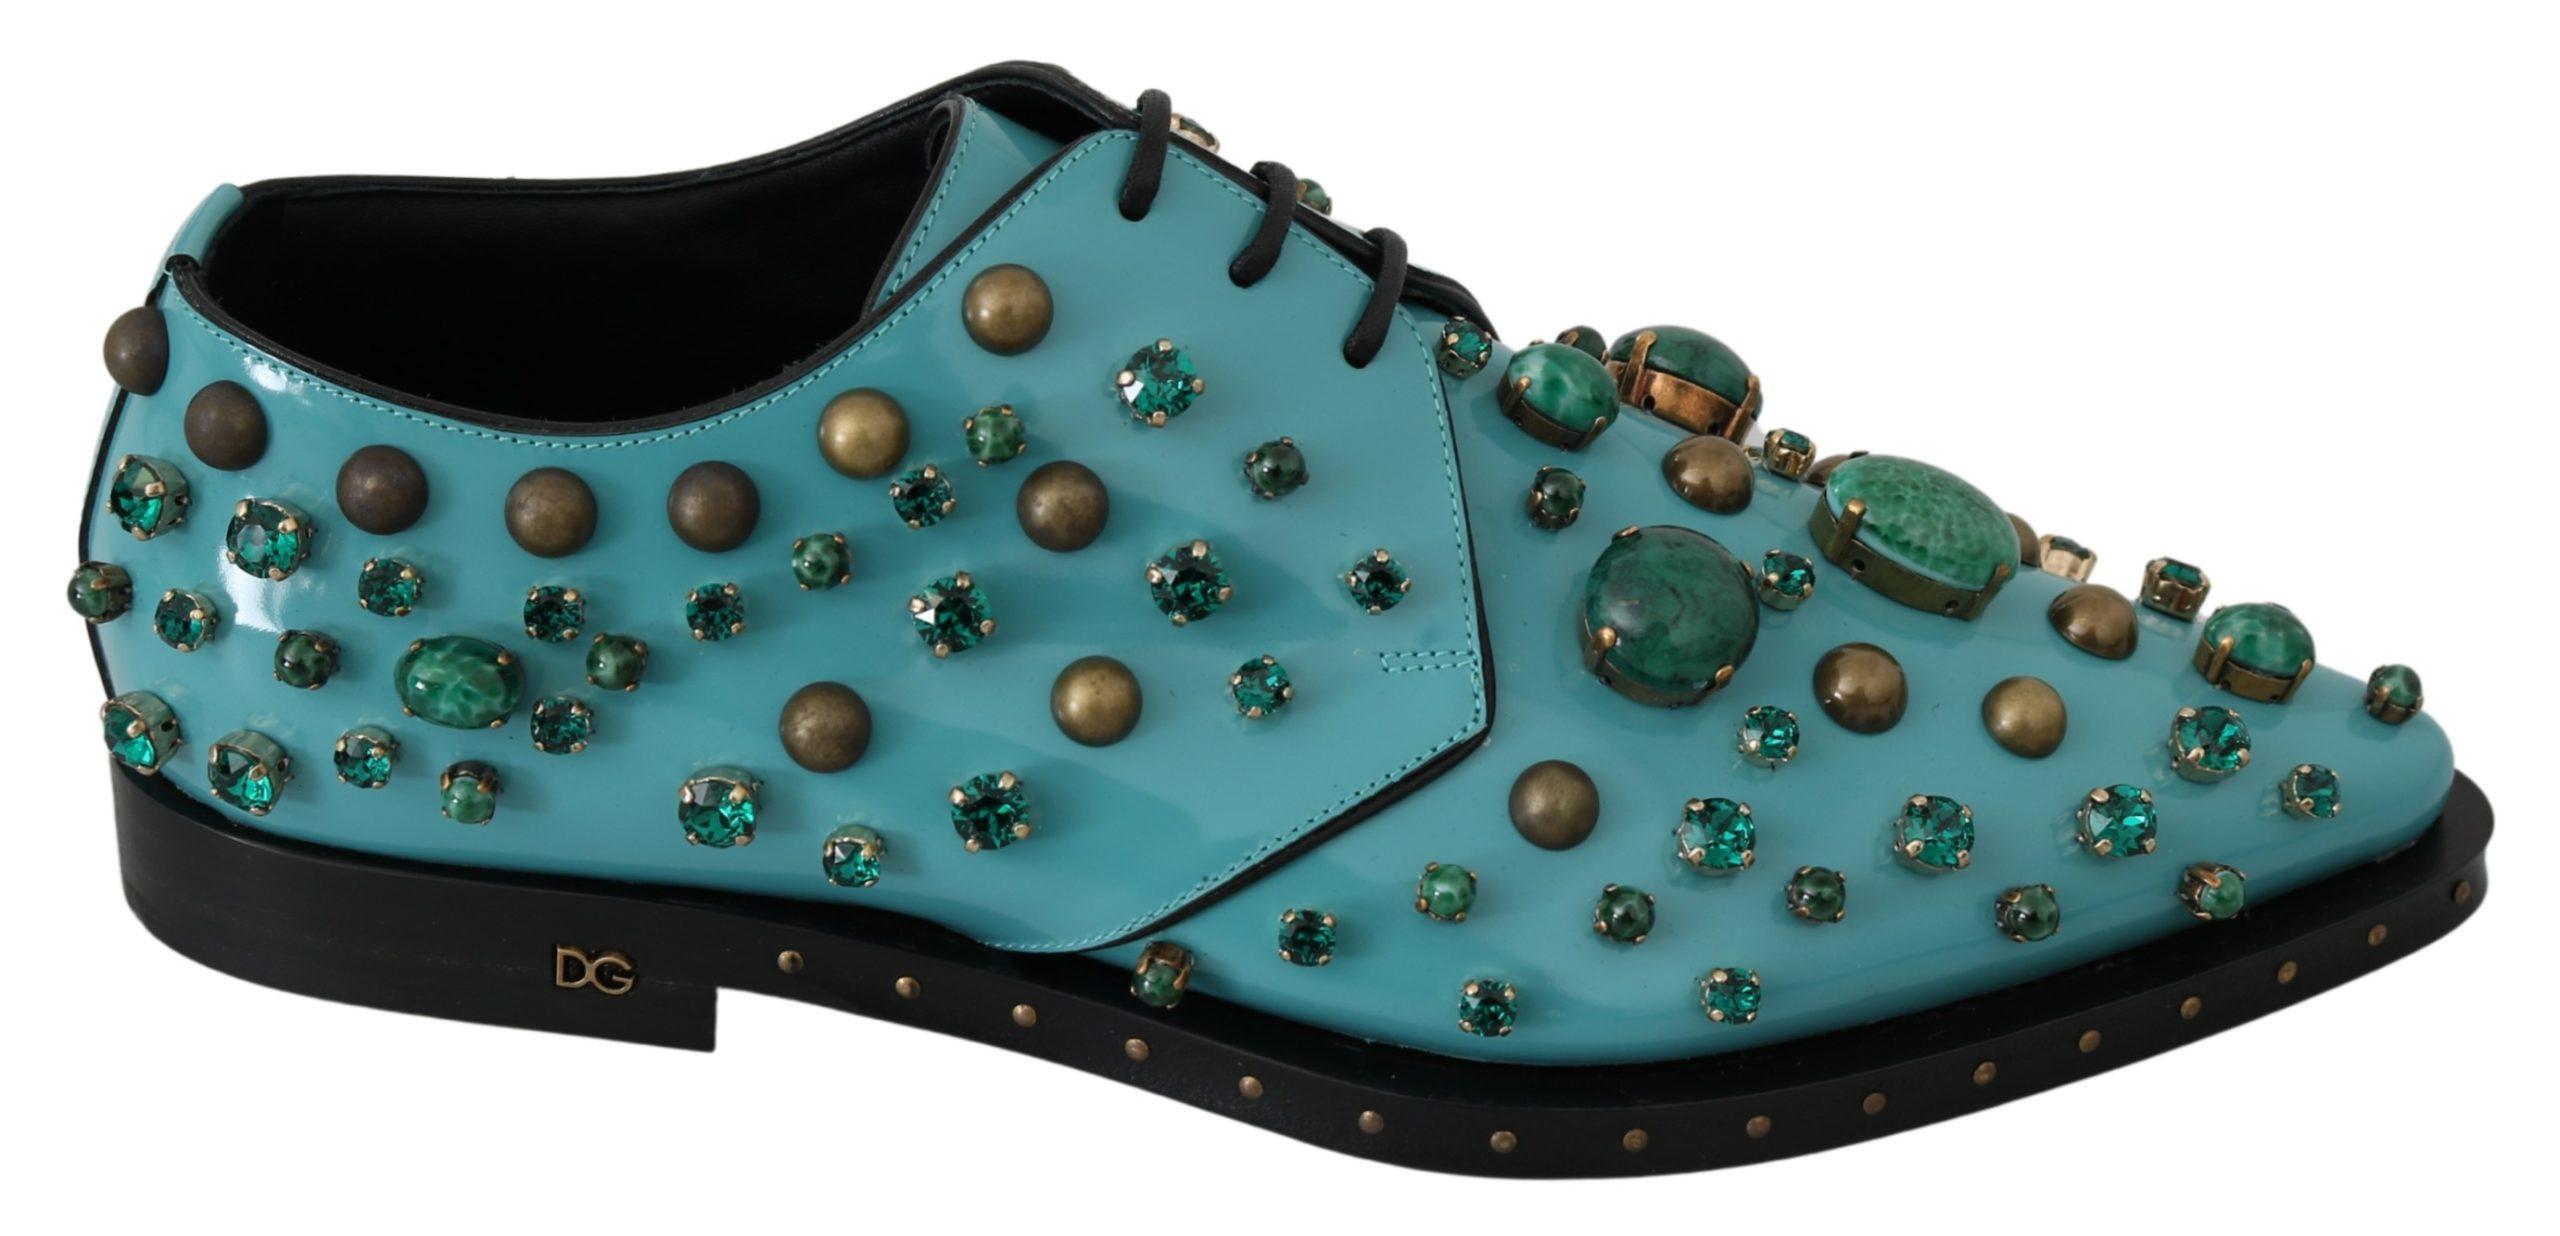 Blue Leather Crystal Dress Broque Shoes - EU39/US8.5